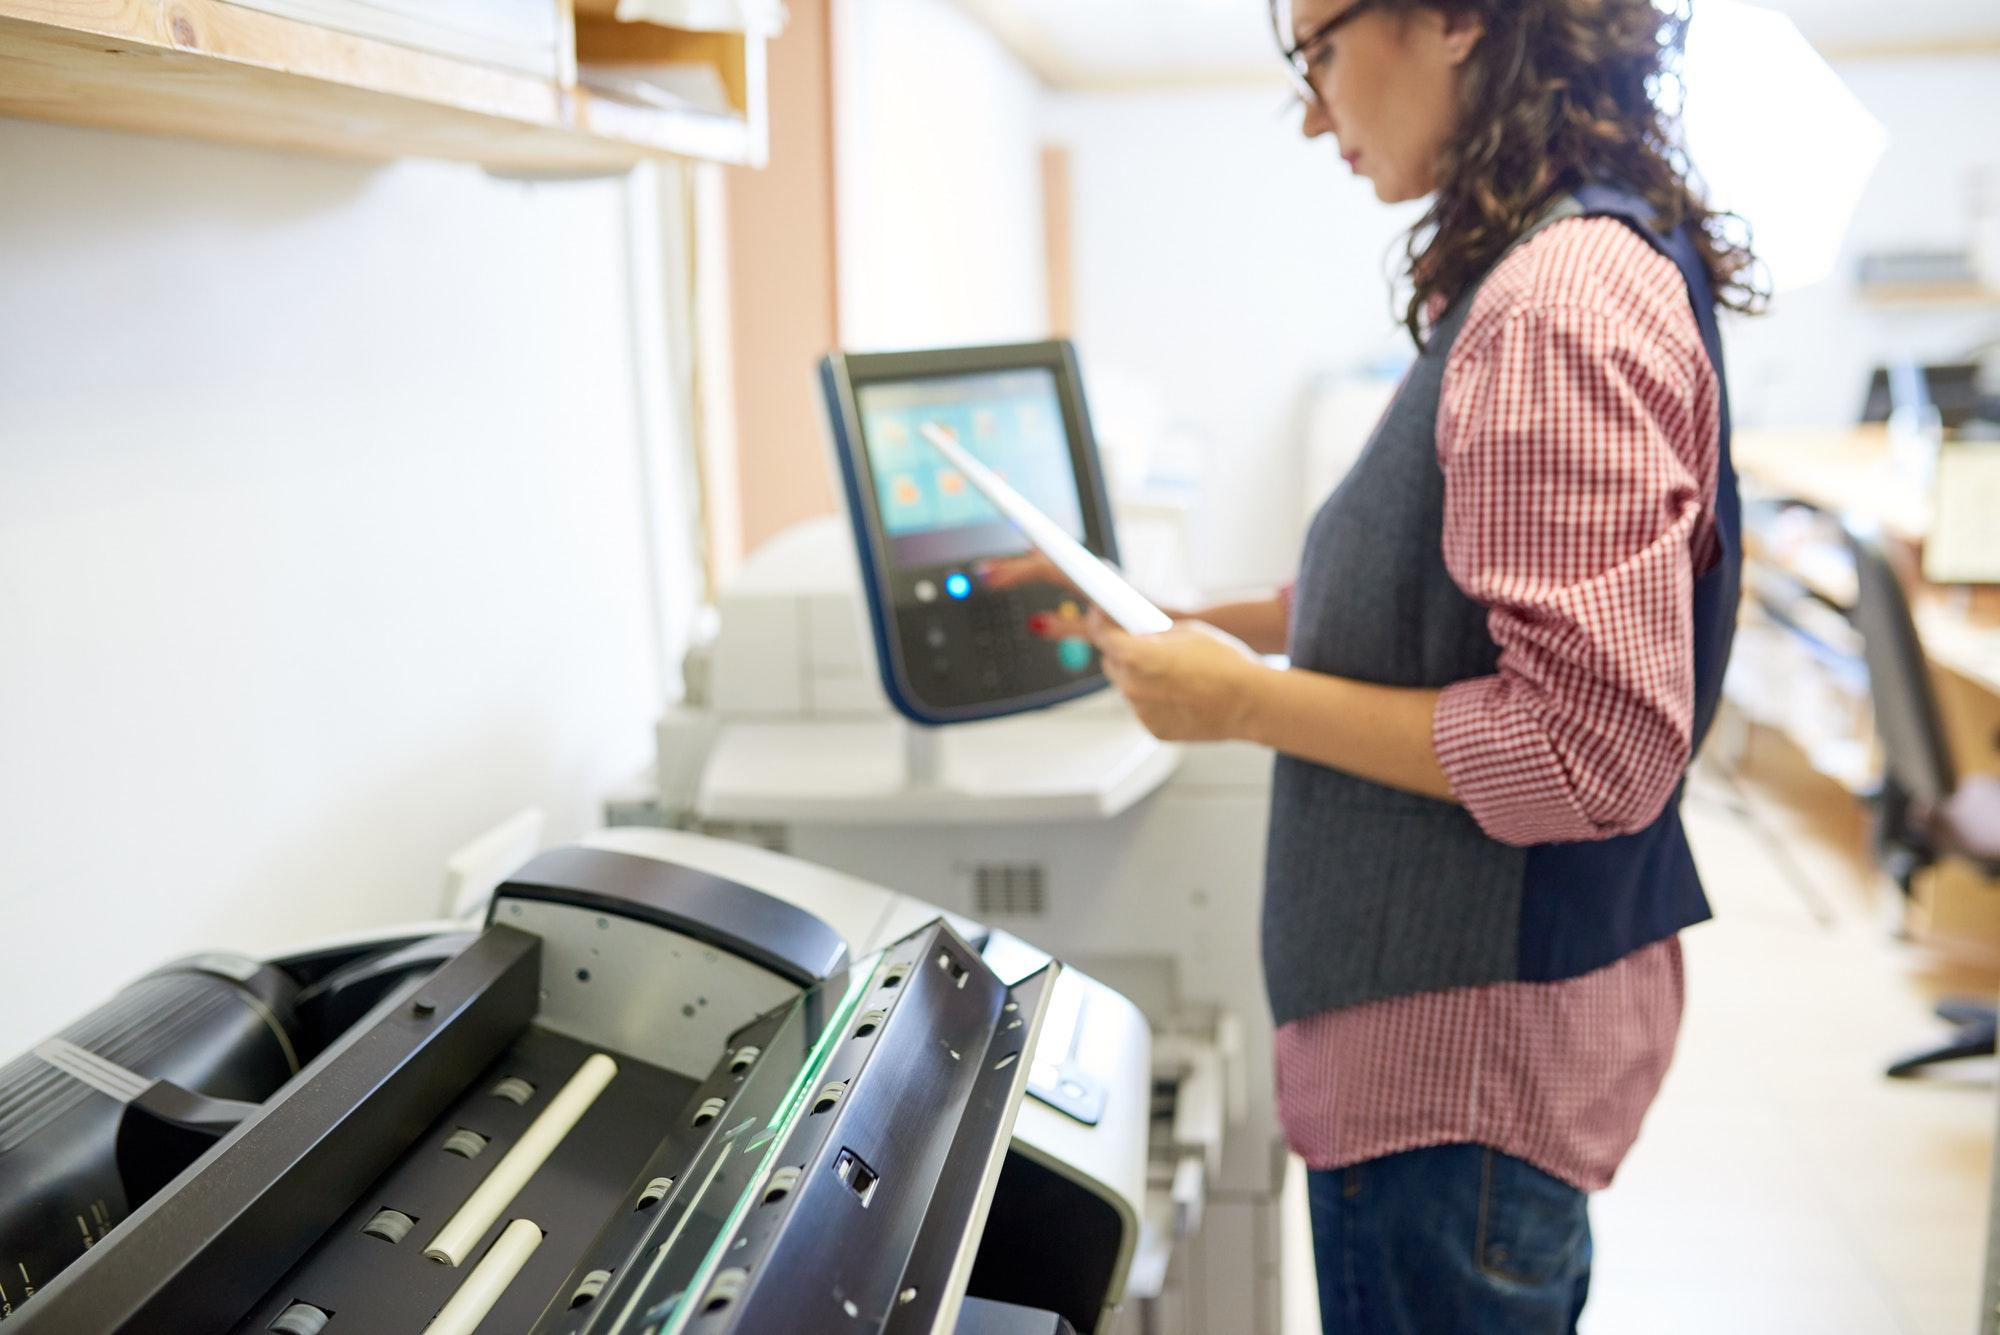 Woman adjusting settings on printer